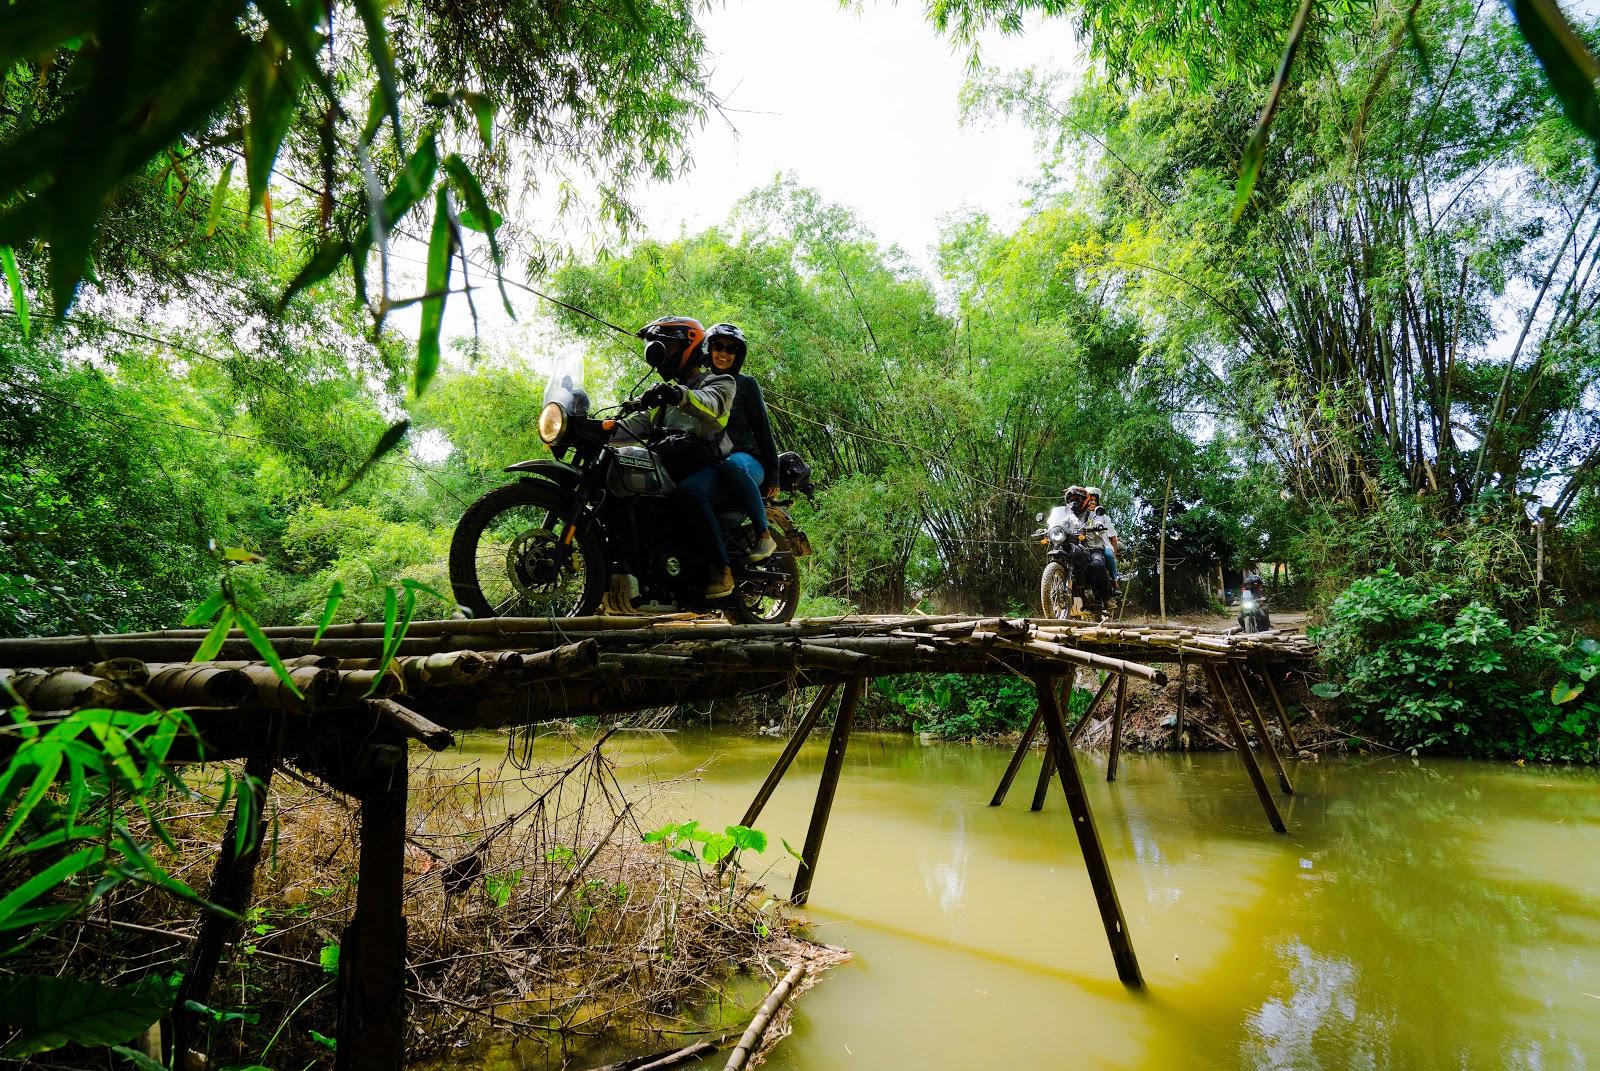 Onyabike Adventures on one of their motorbike tours in Vietnam